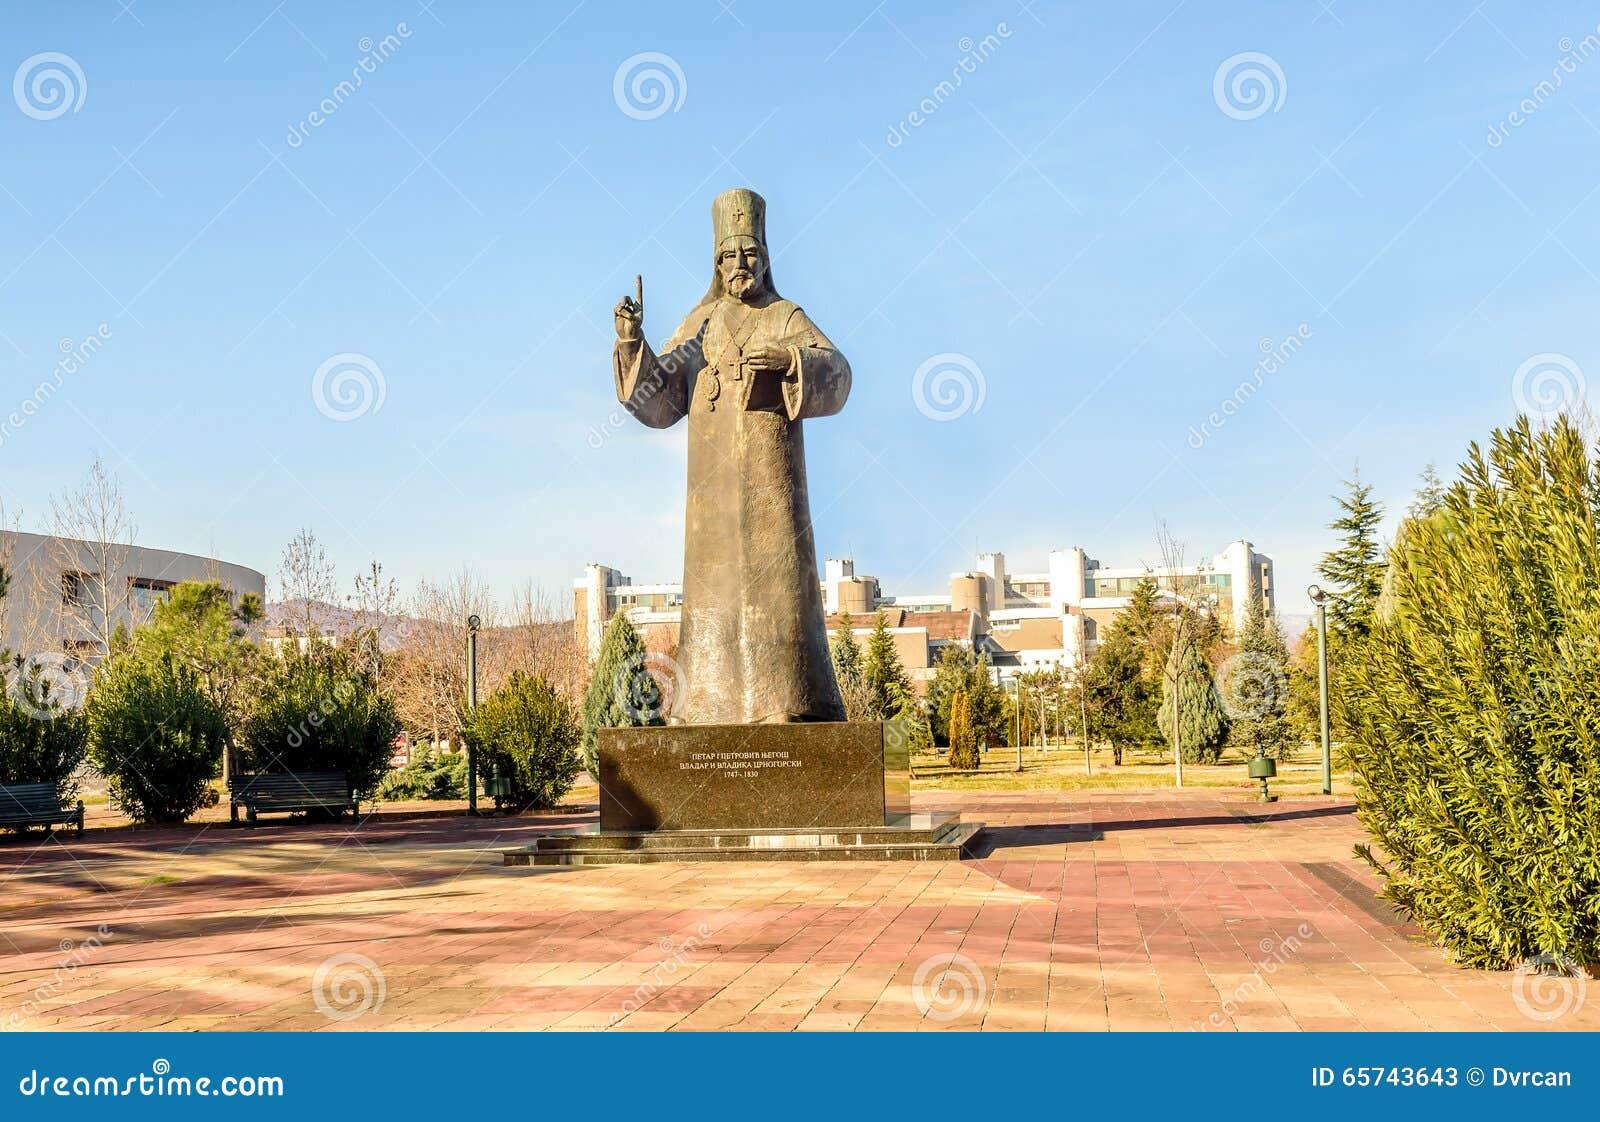 Statue de Petar I Petrovic Njegos à Podgorica, Monténégro